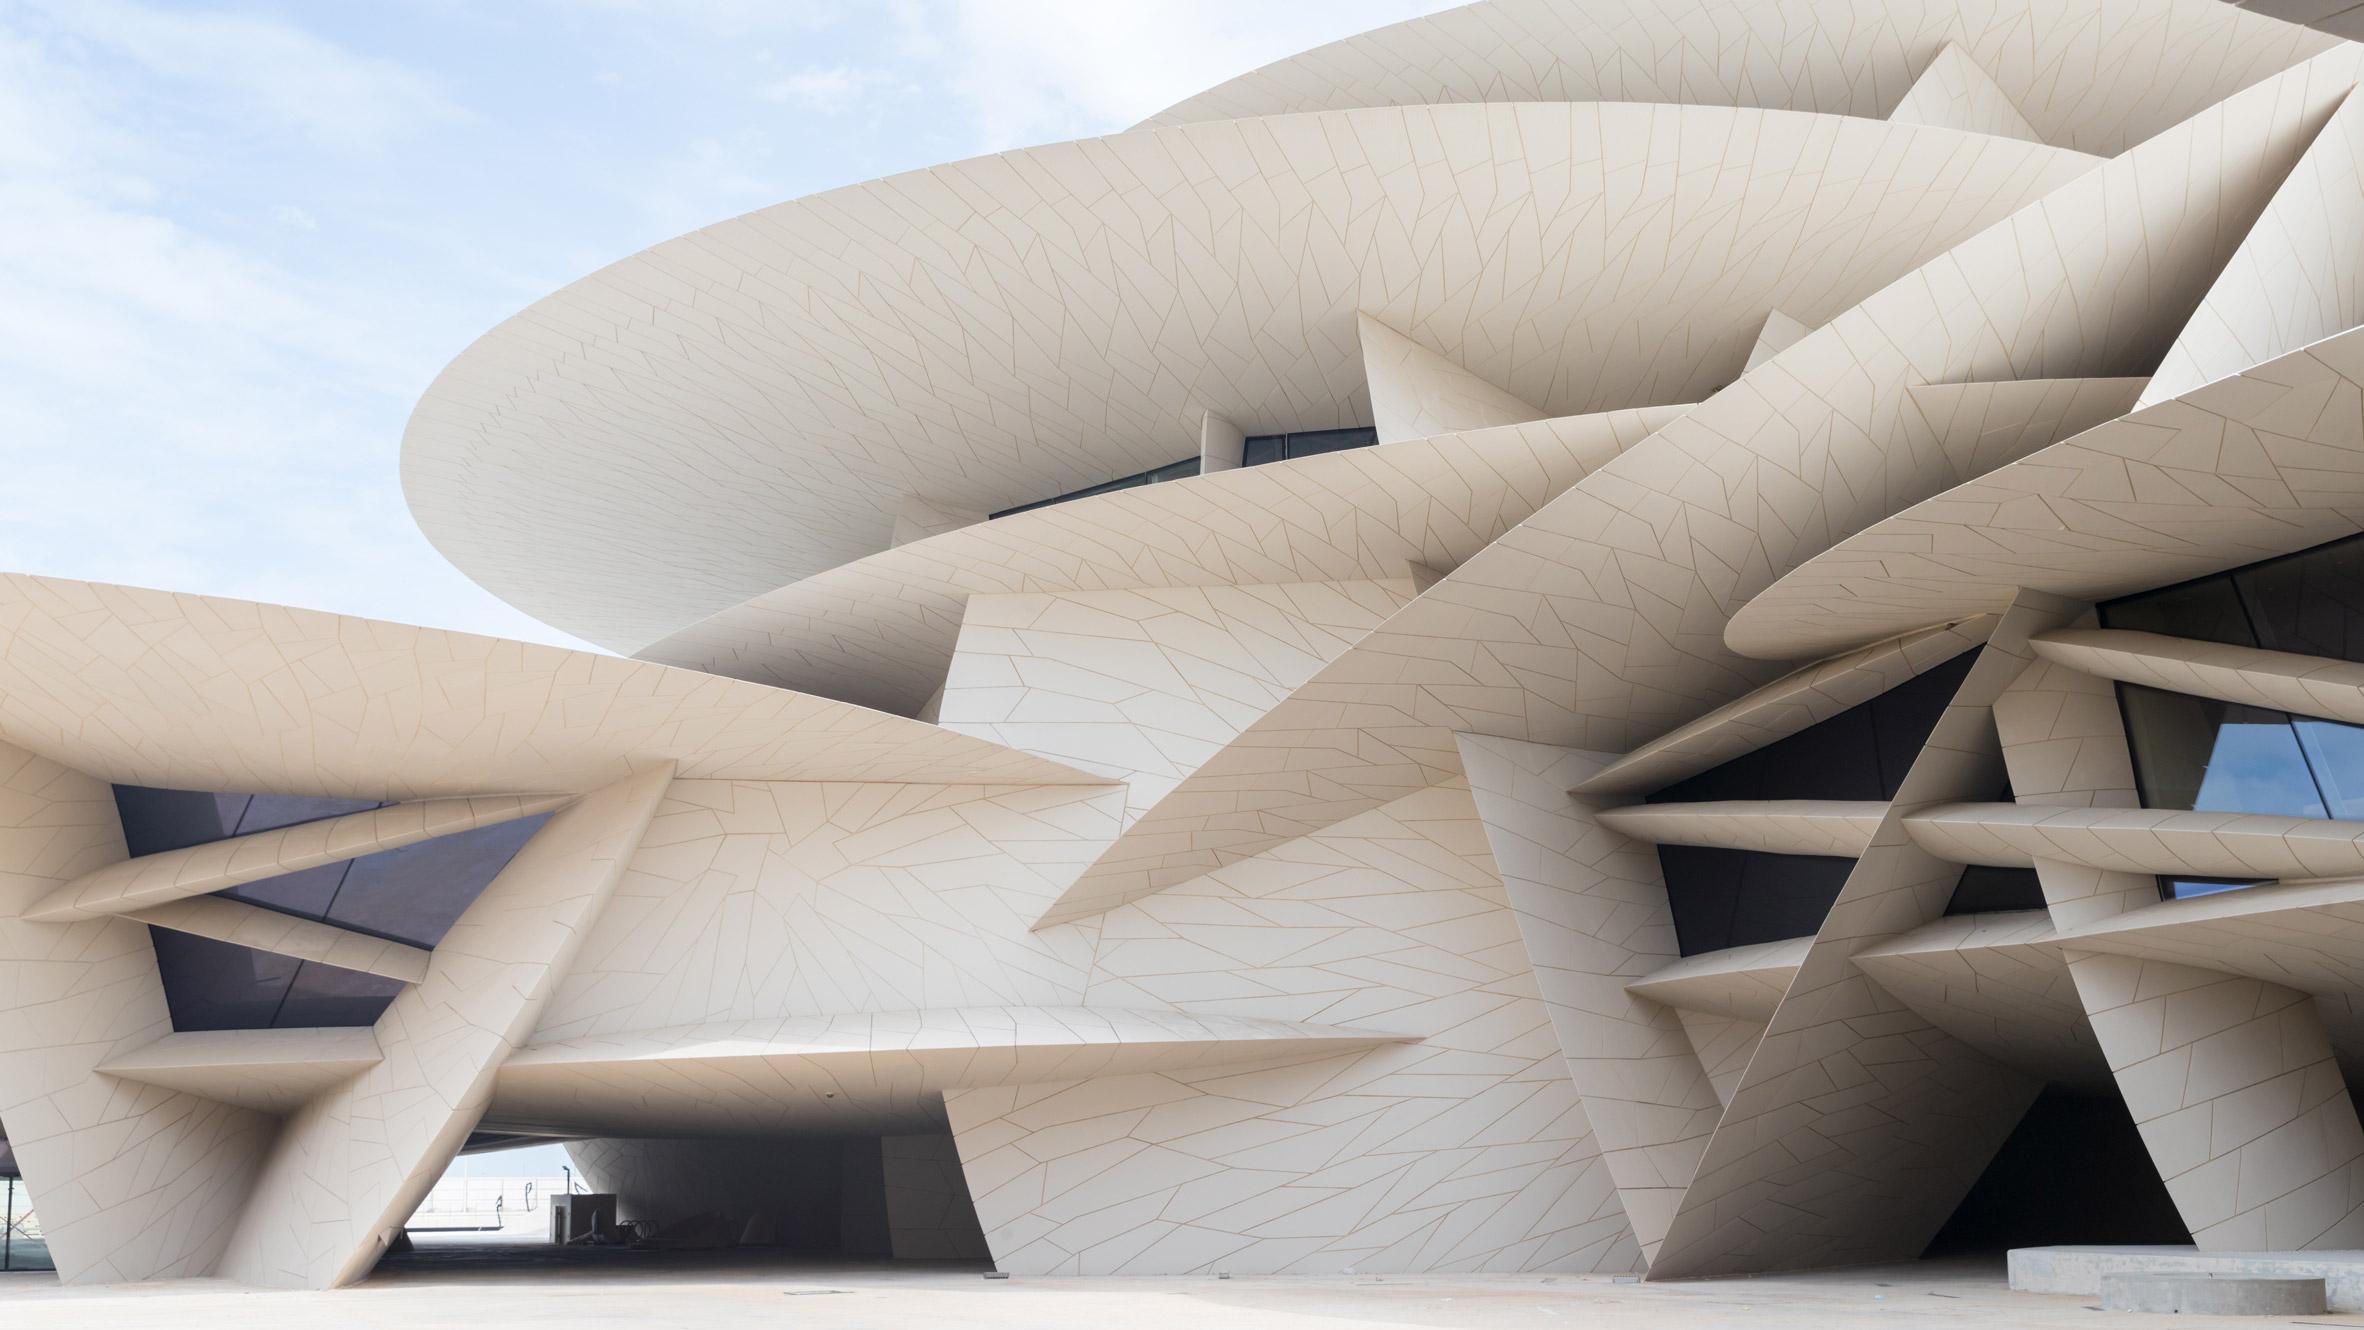 This week on Dezeen: National Museum of Qatar in Doha